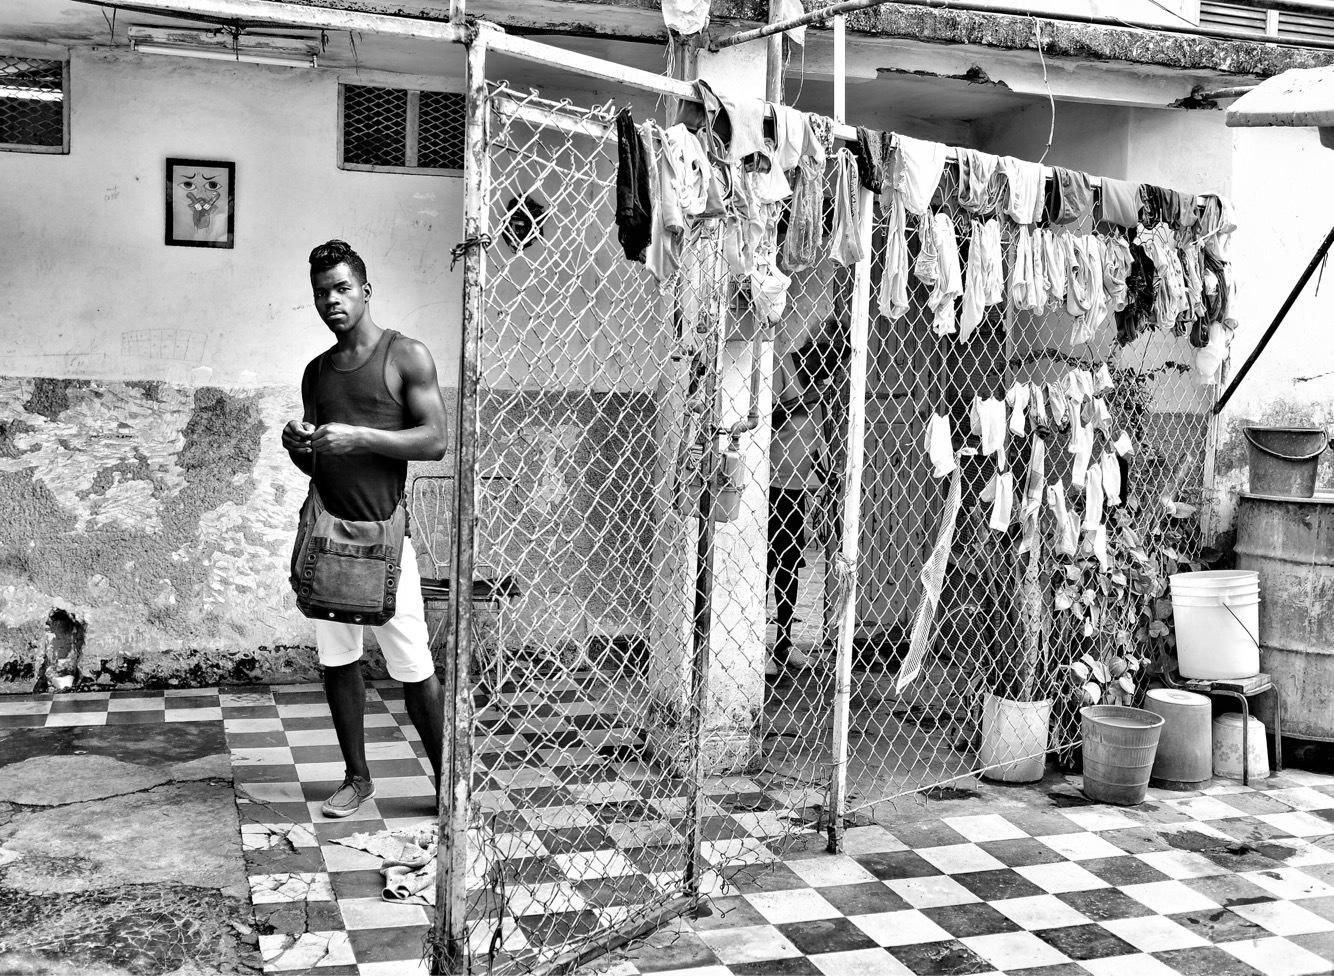 How do you dry your underwear? by Staraliska